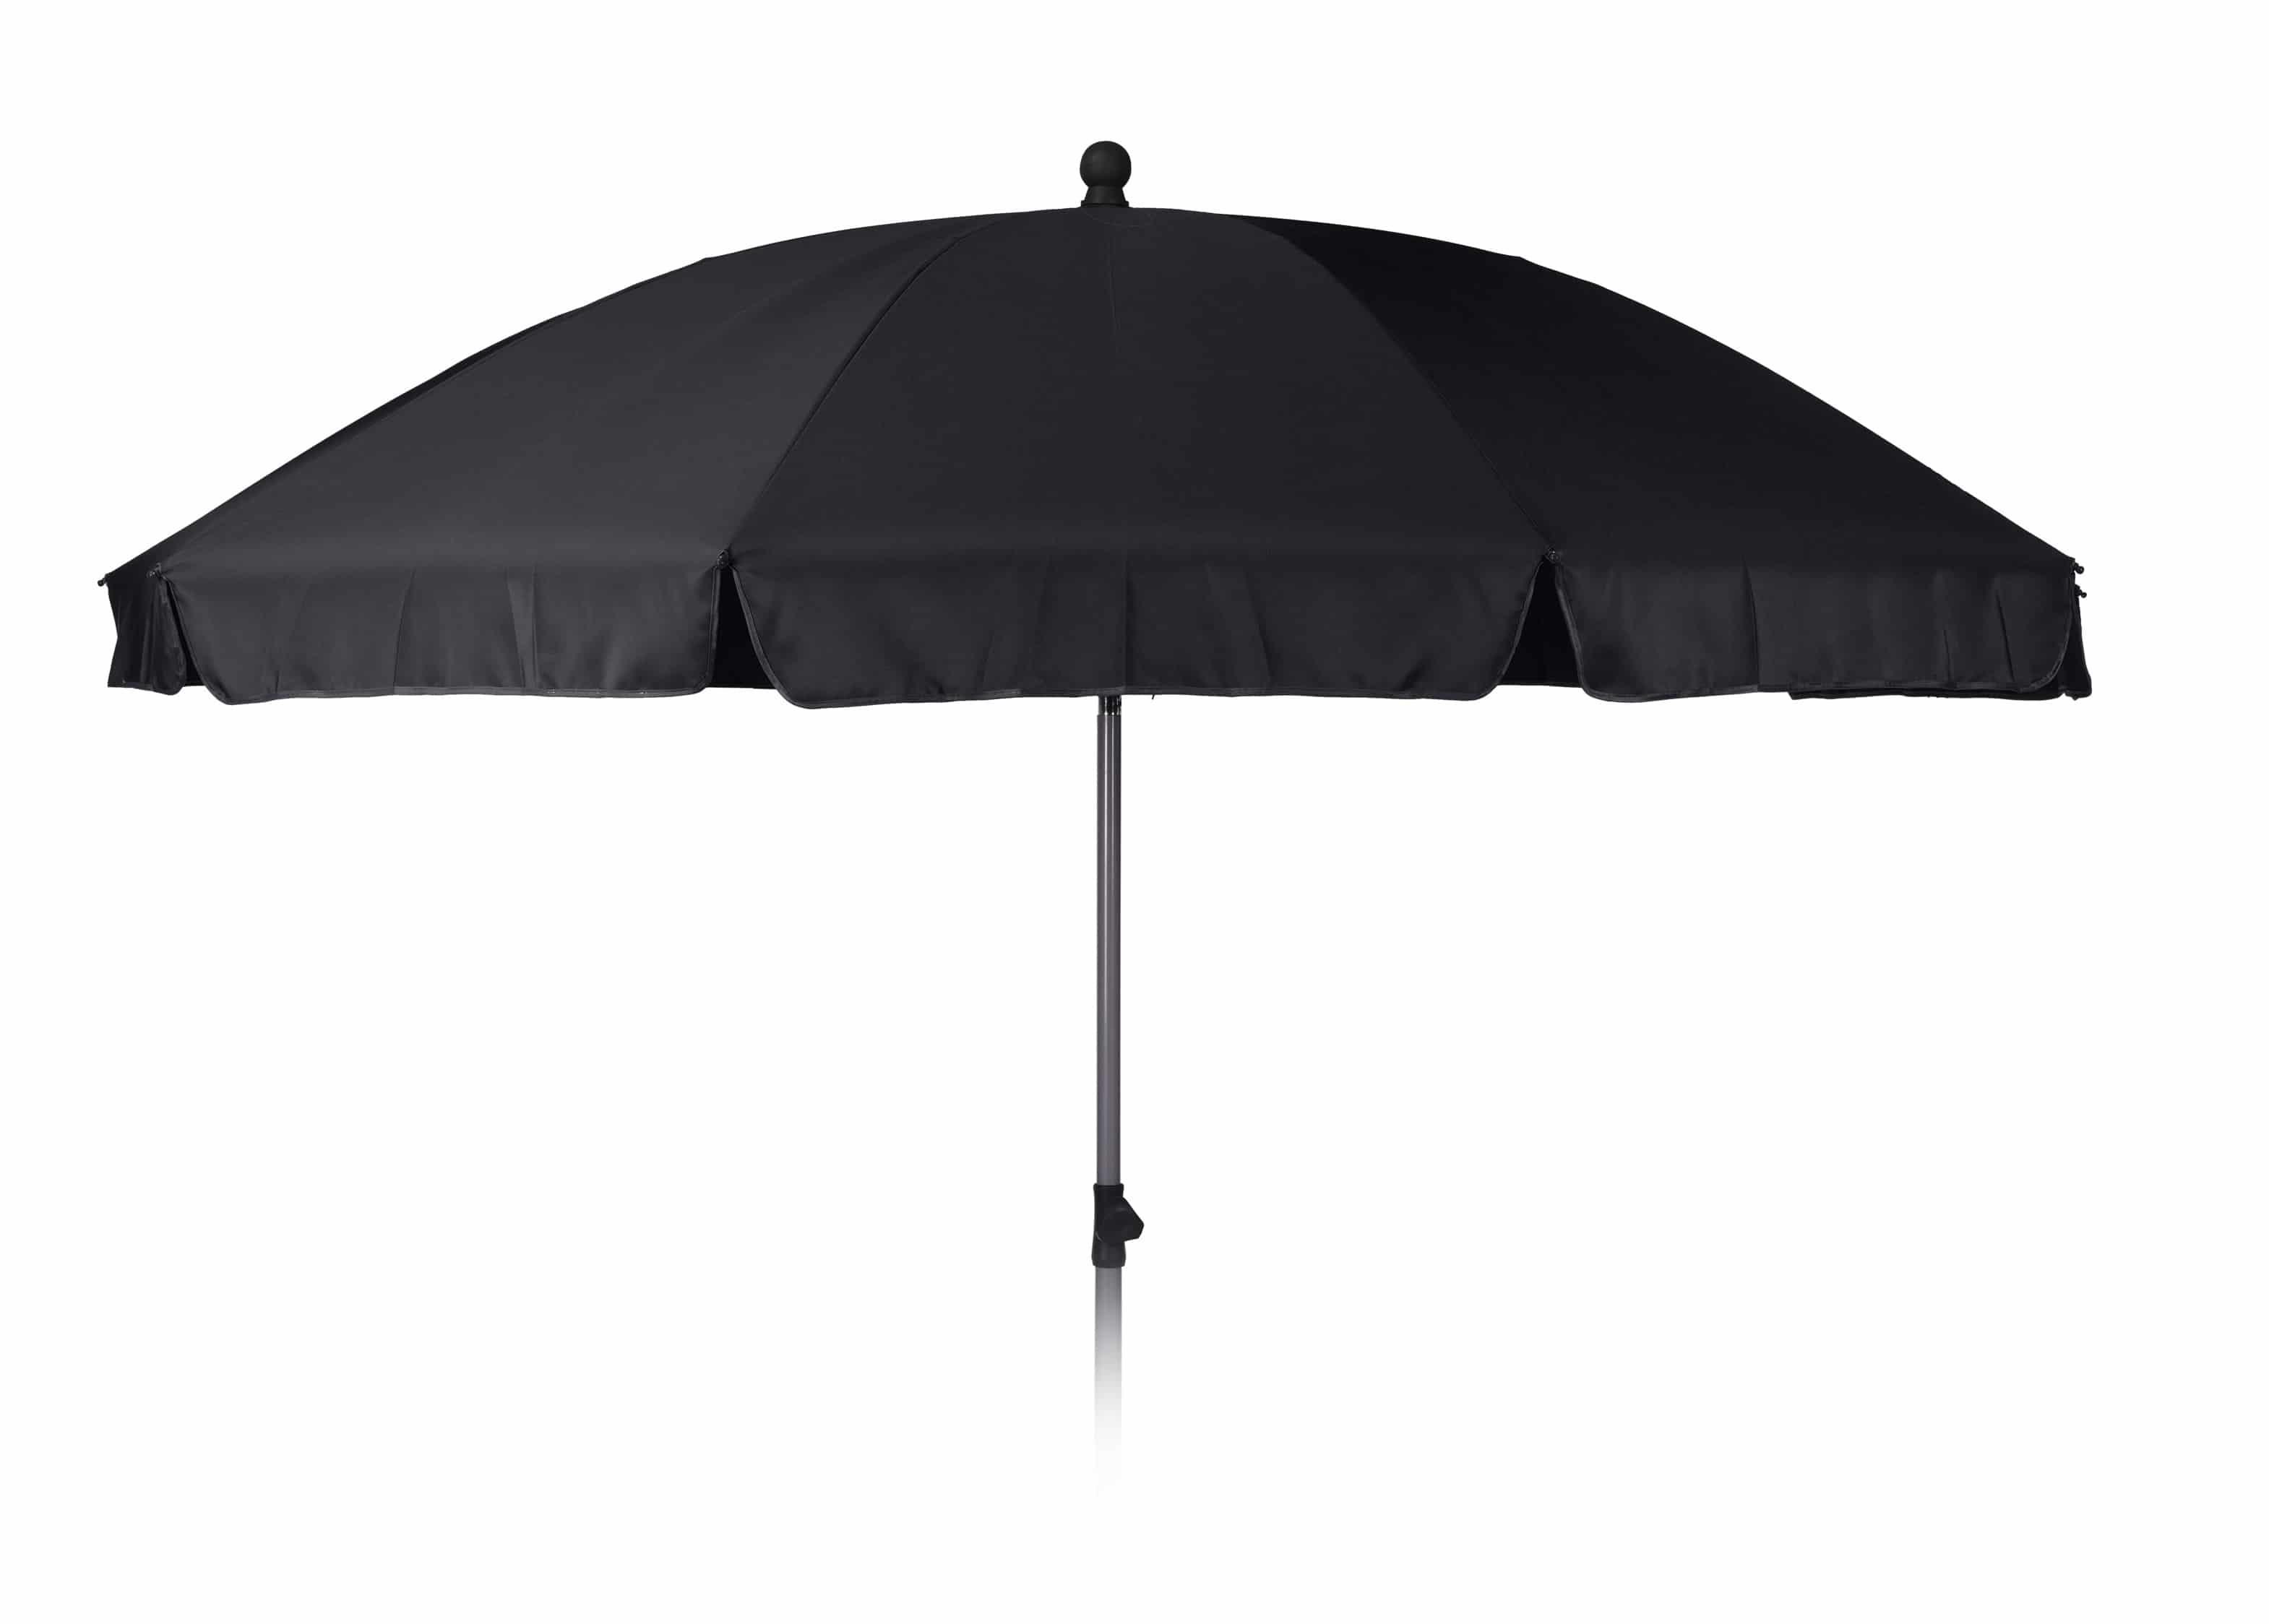 4goodz Parasol 250 cm met Knikarm met volant - grijze buis - Grijs